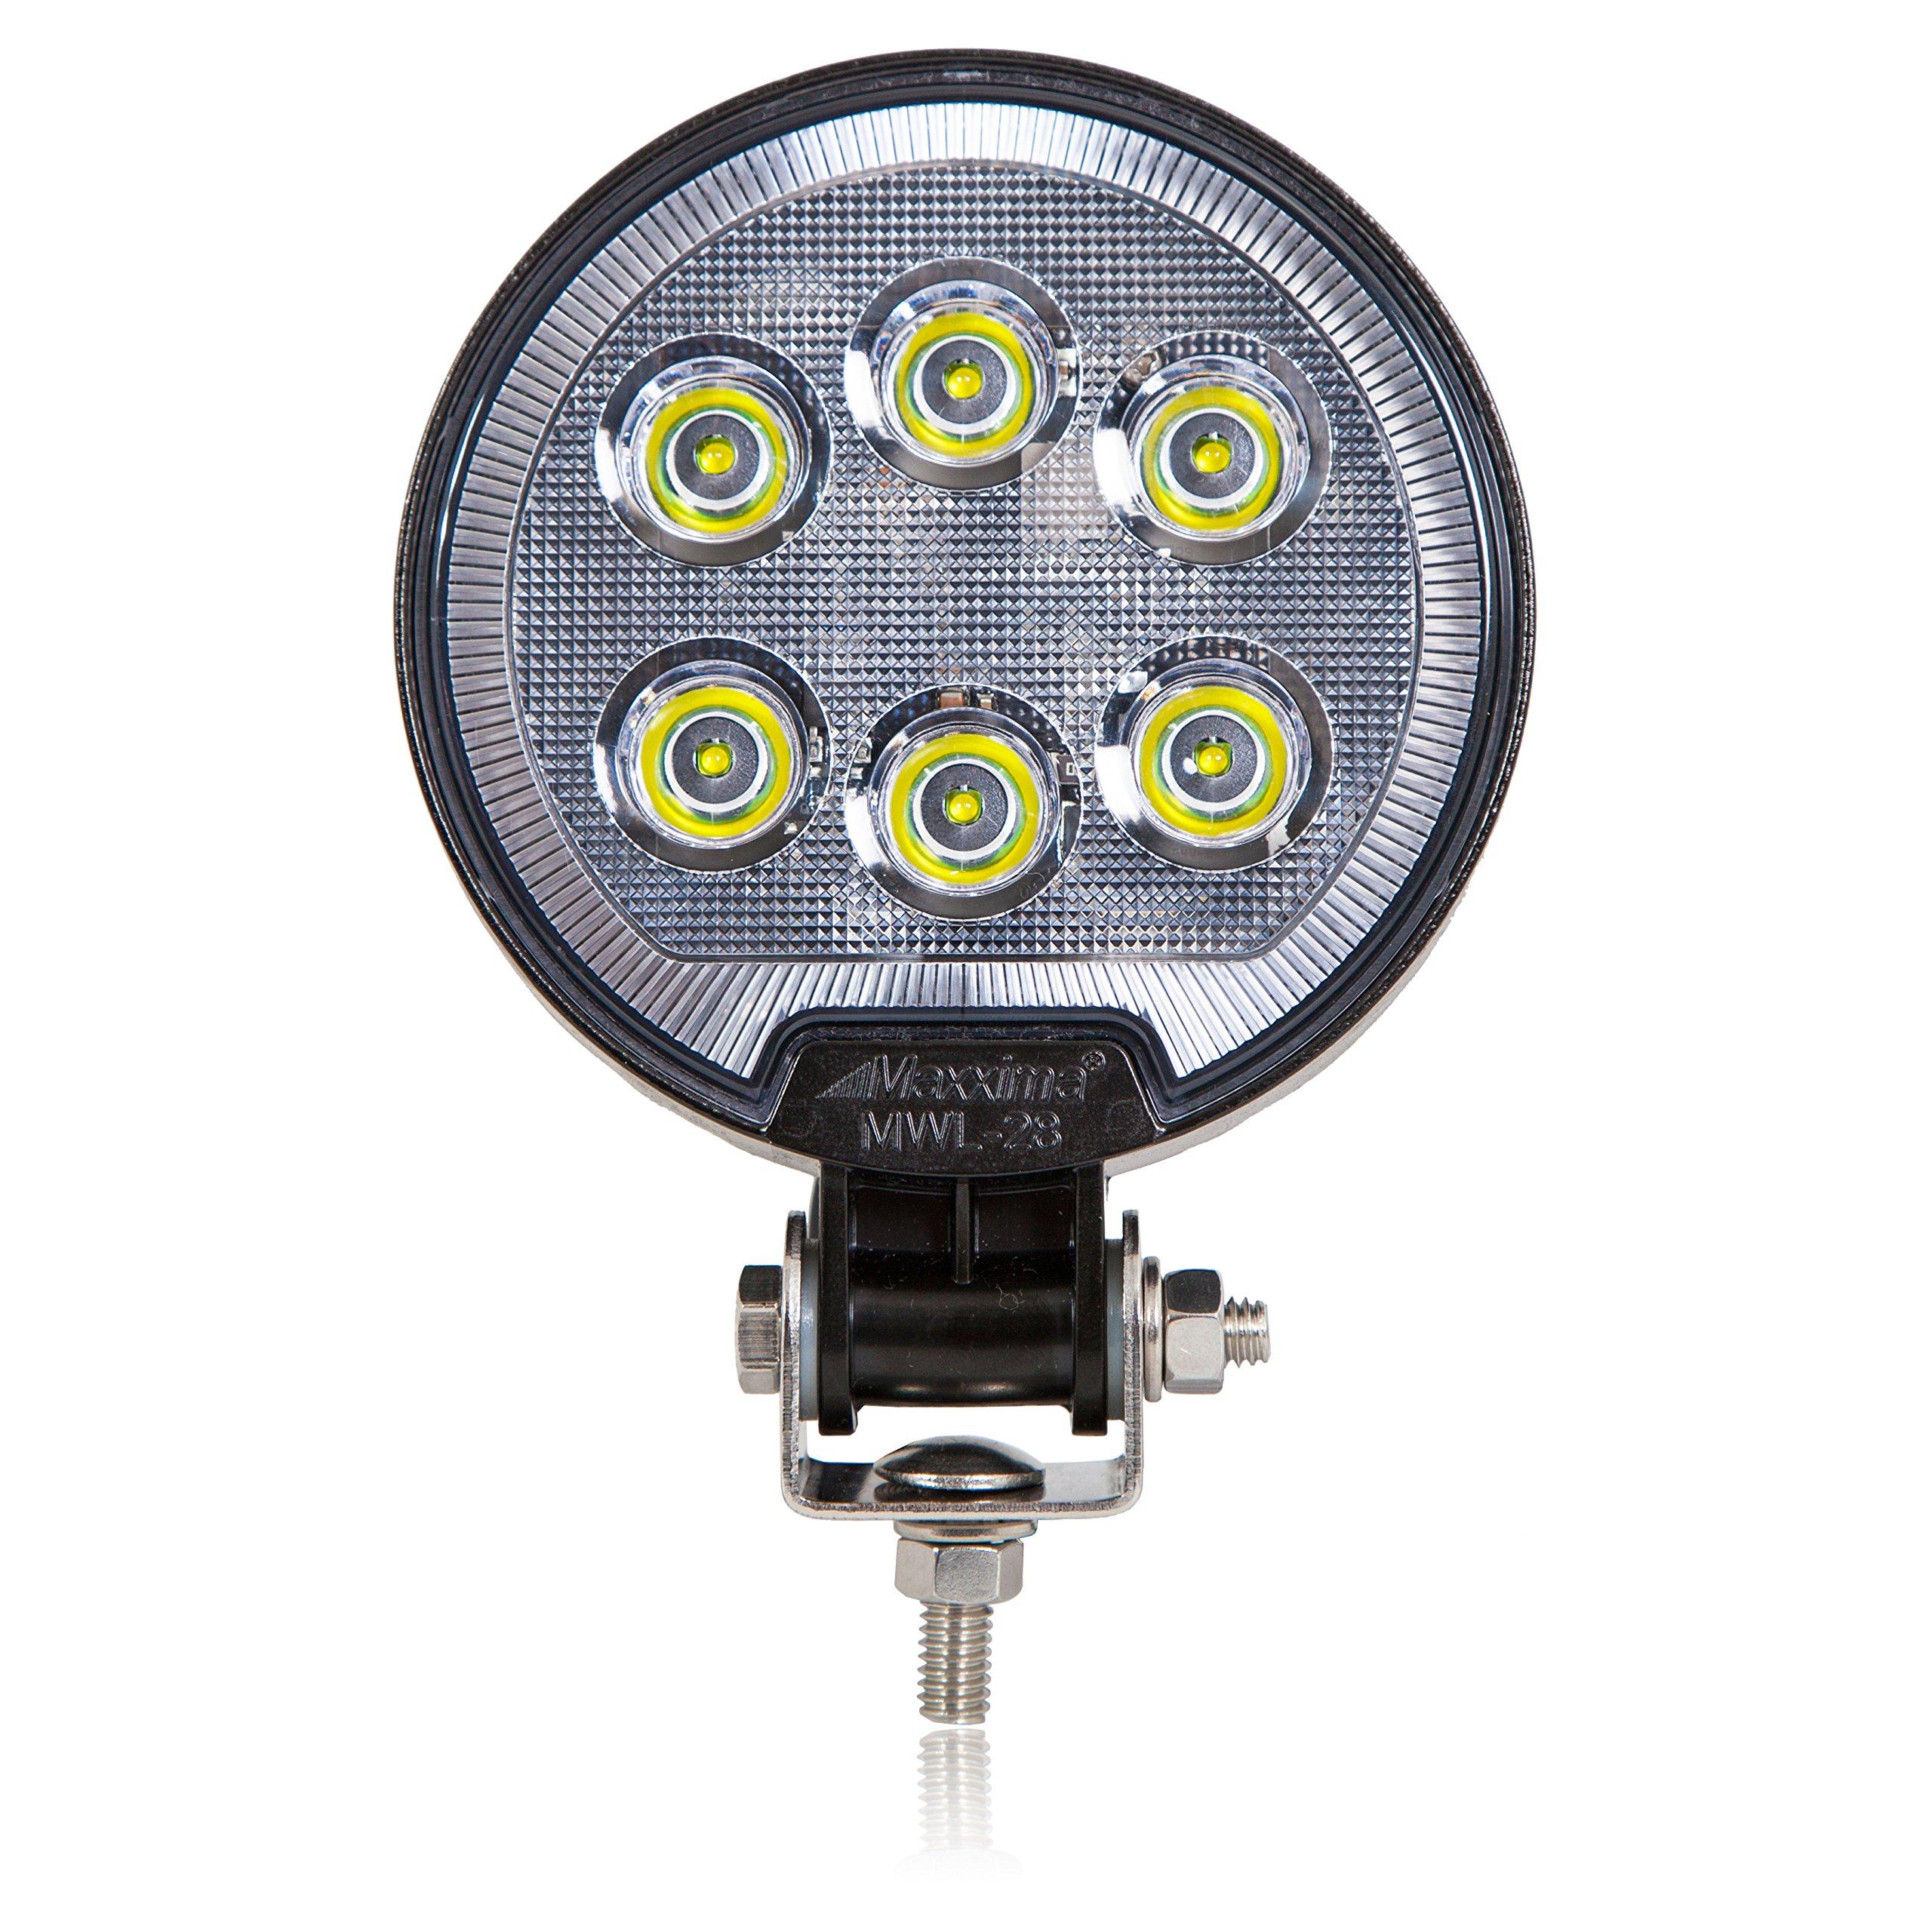 Maxxima MWL-28 6 LED Round Work Light 1,200 Lumens by Maxxima